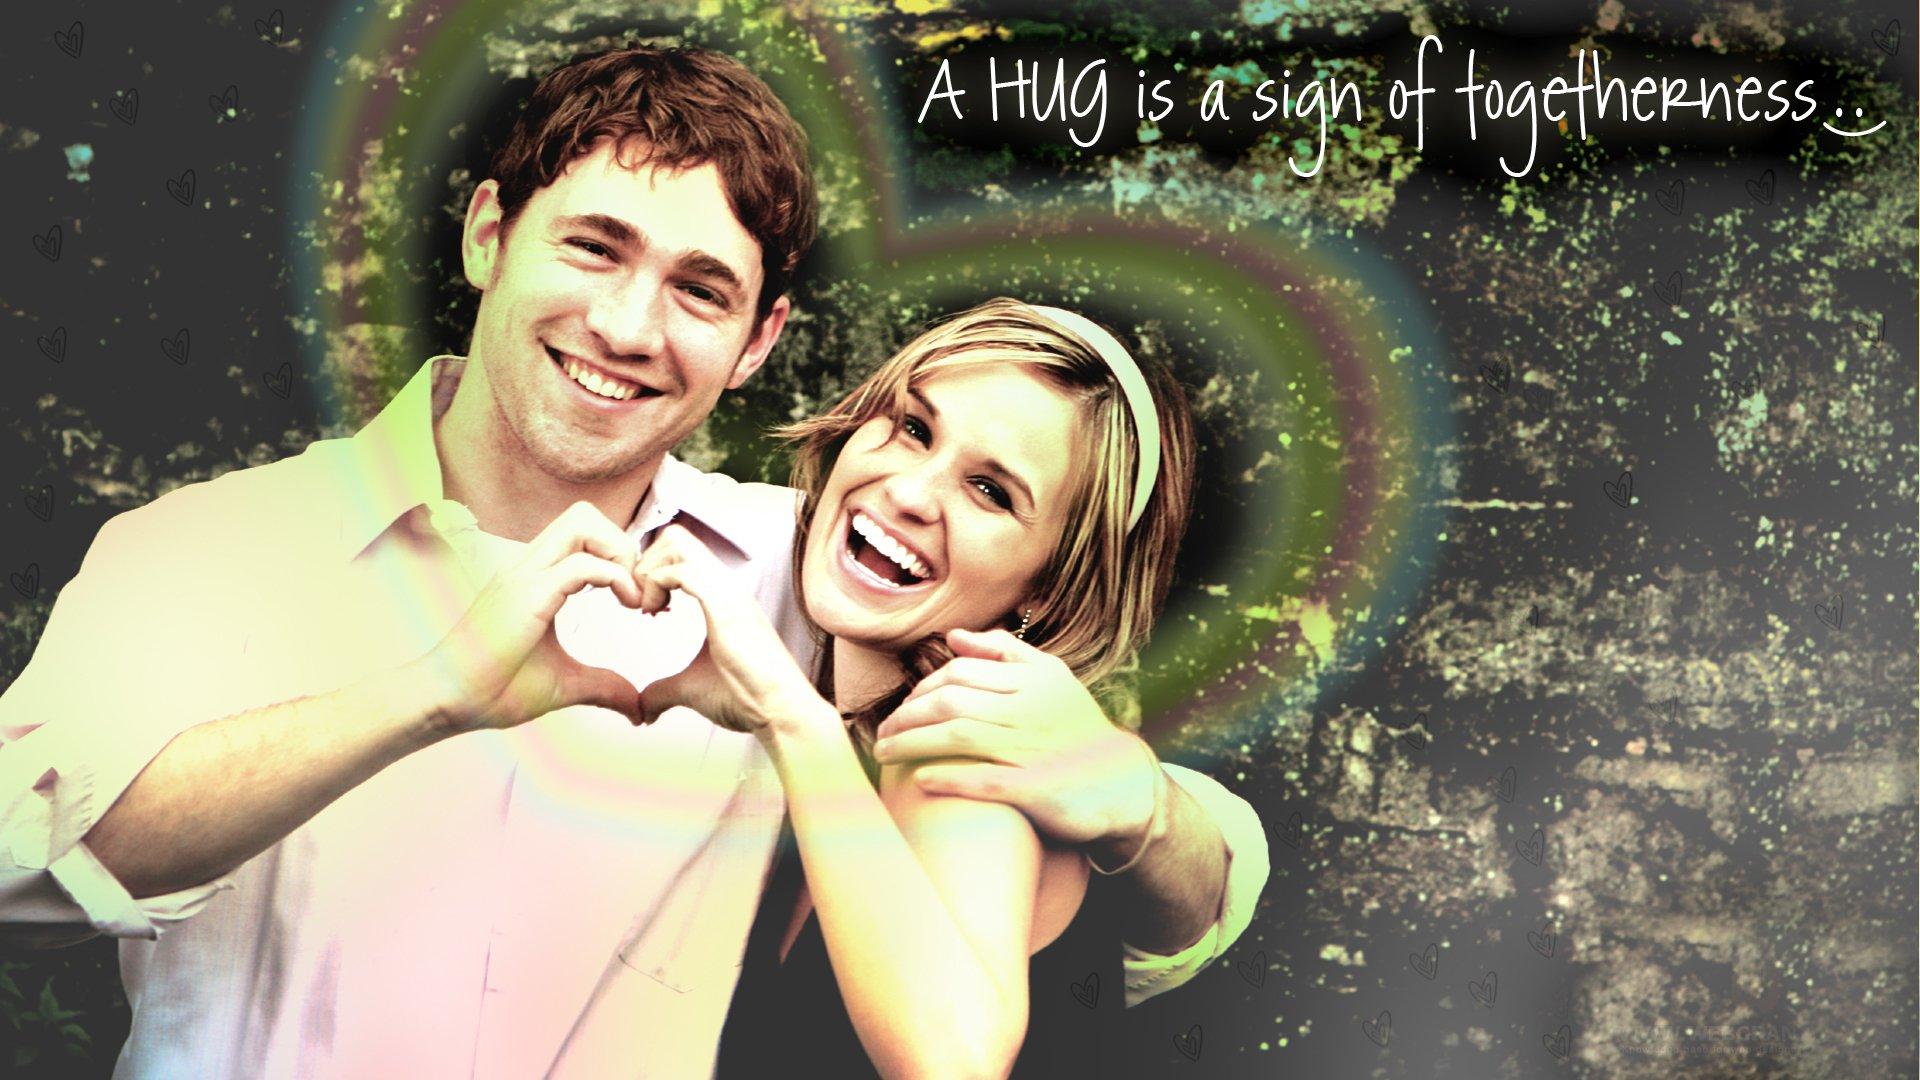 Lovely Hugging Couple Wallpaper Hug Hugging Couple Love Mood